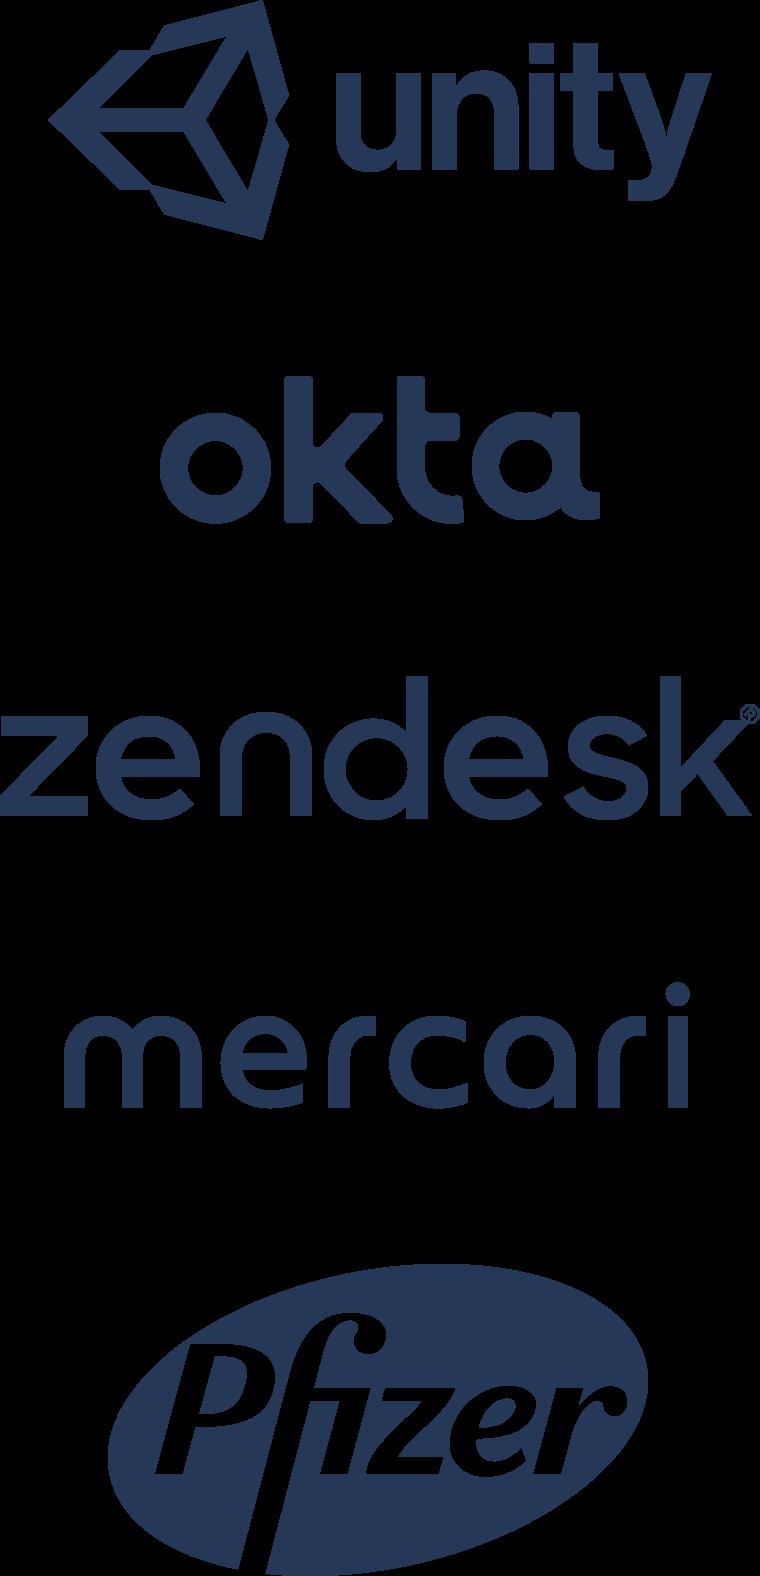 Unity、Okta、Zendesk、Mercari、Pfizer 的徽标